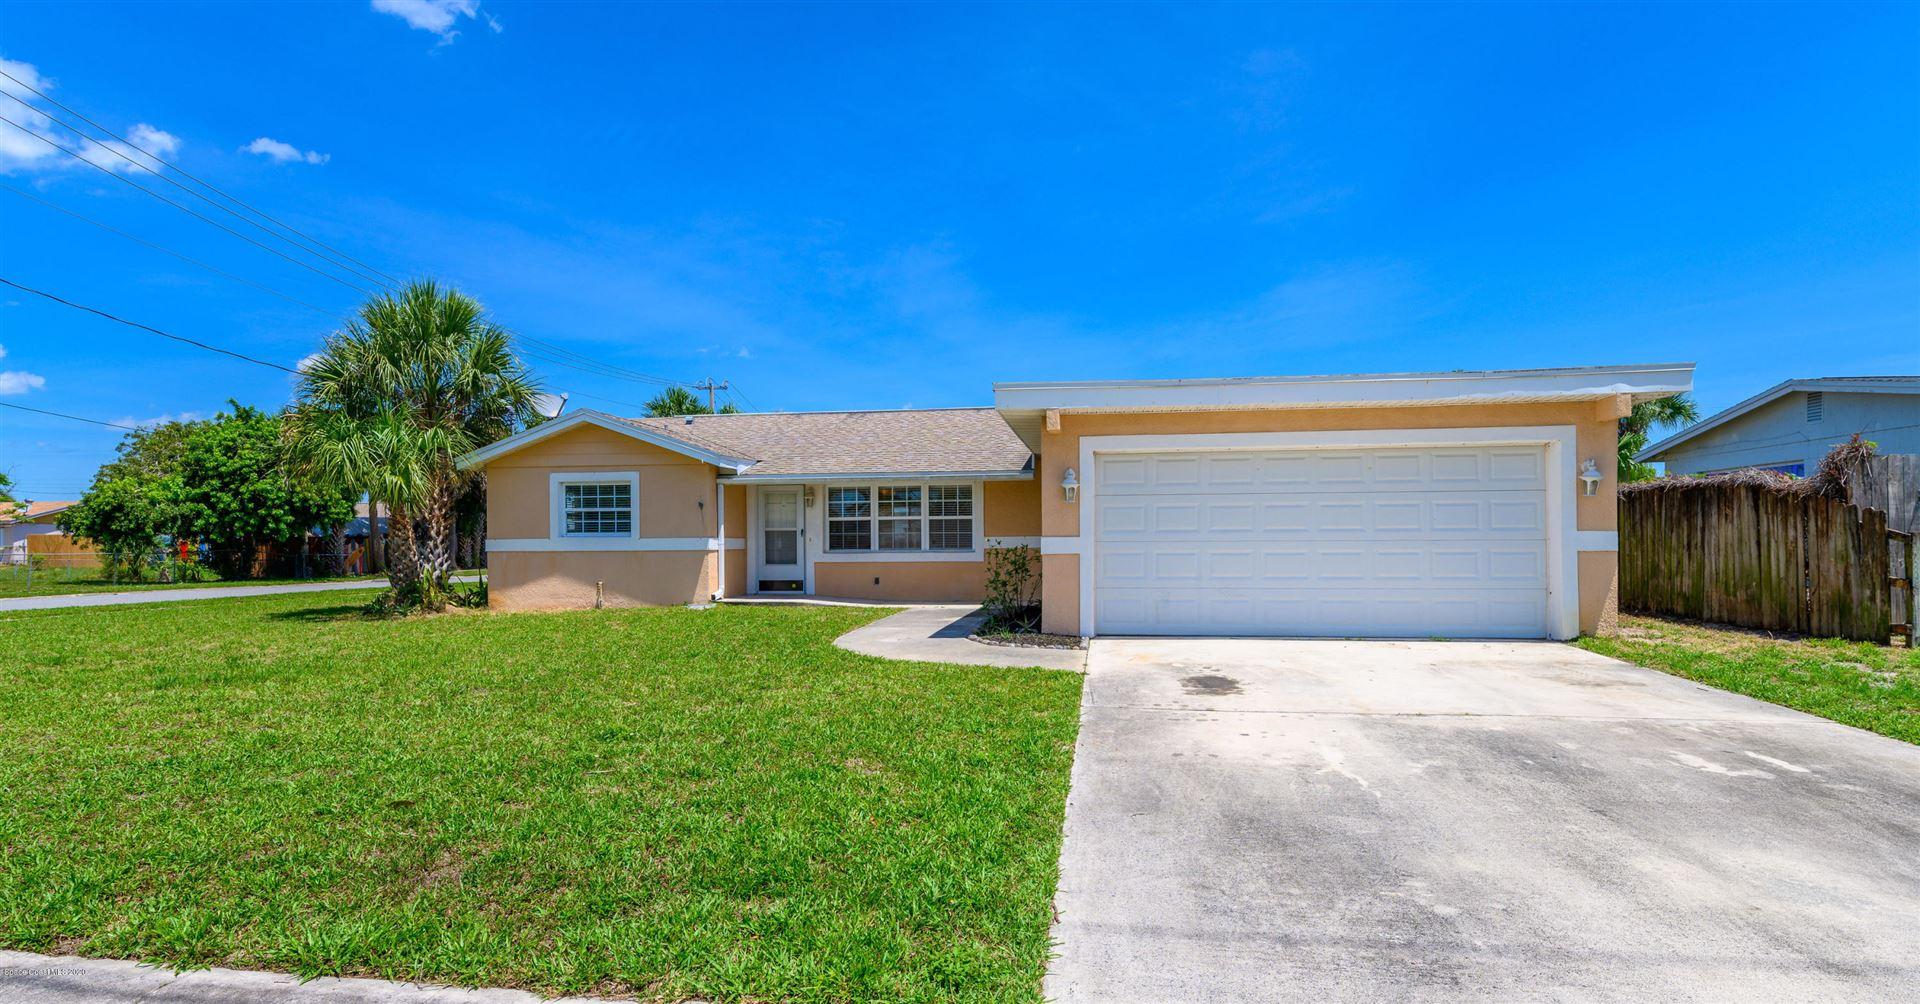 770 Richland Avenue, Merritt Island, FL 32953 - MLS#: 862454